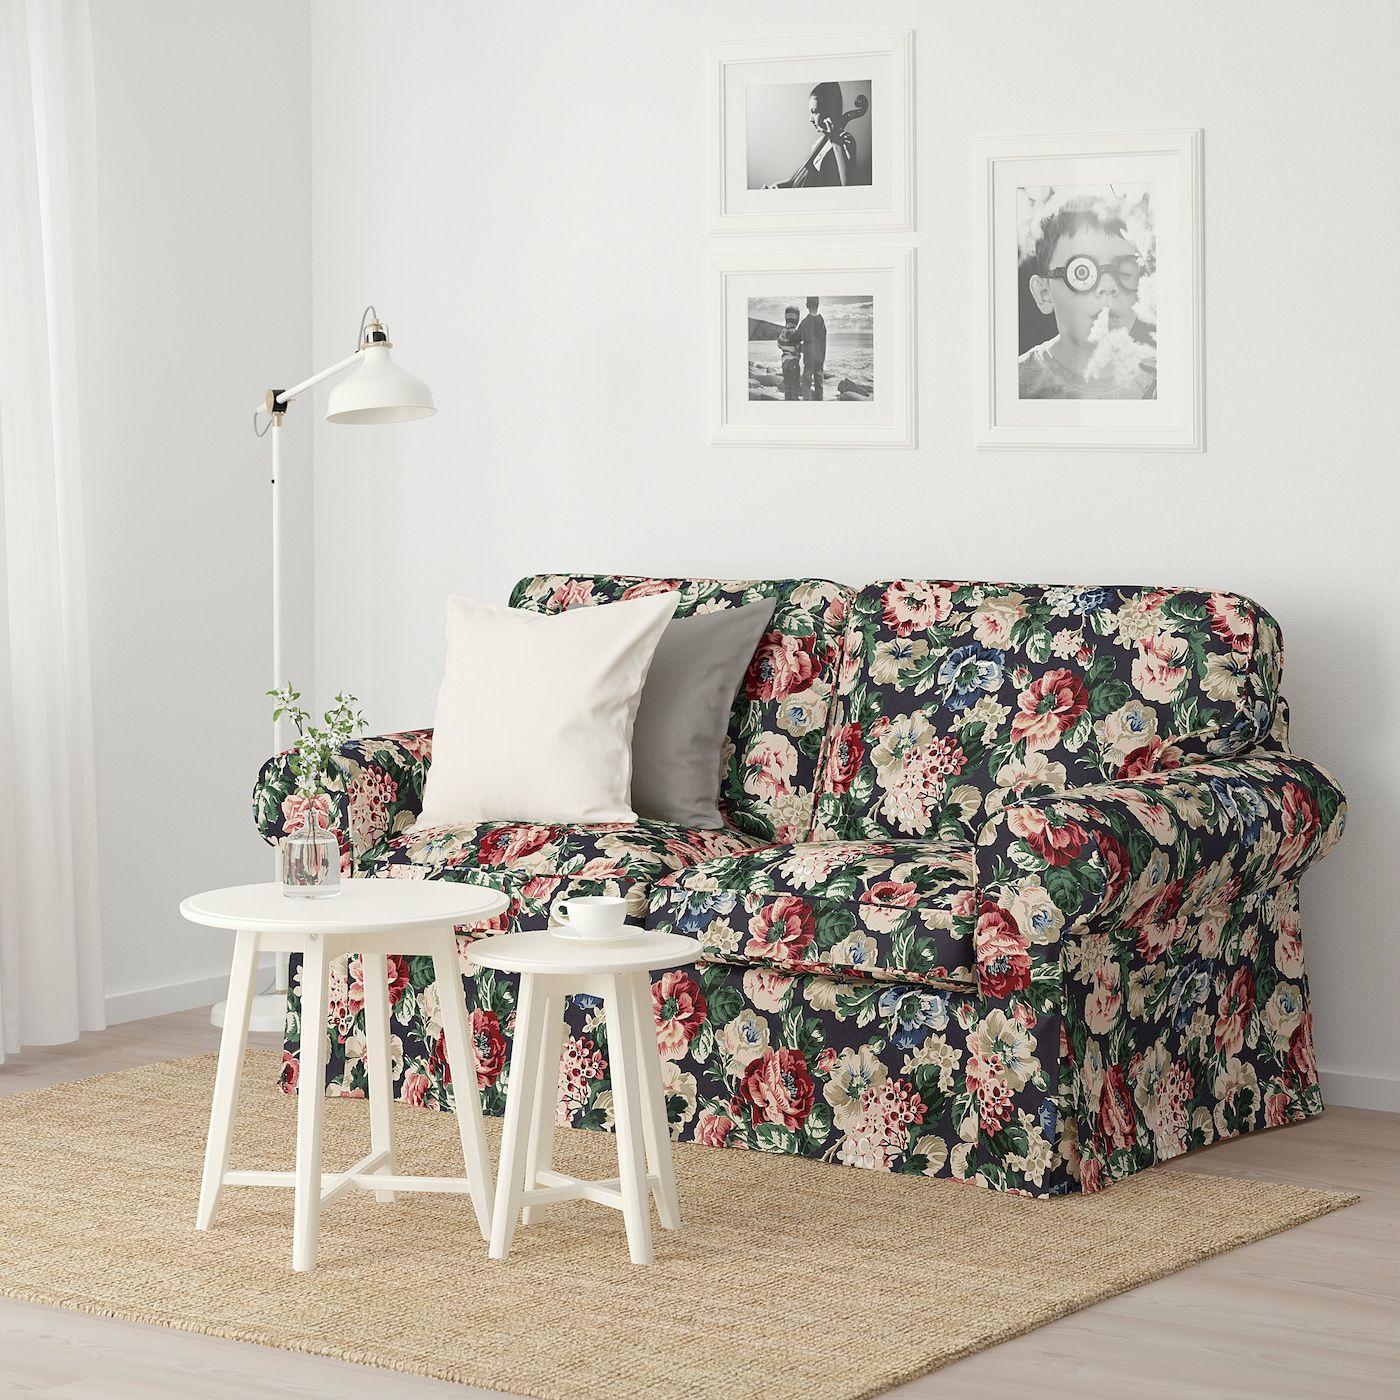 IKEA EKTORP Loveseat Lingbo multicolor Ektorp sofa